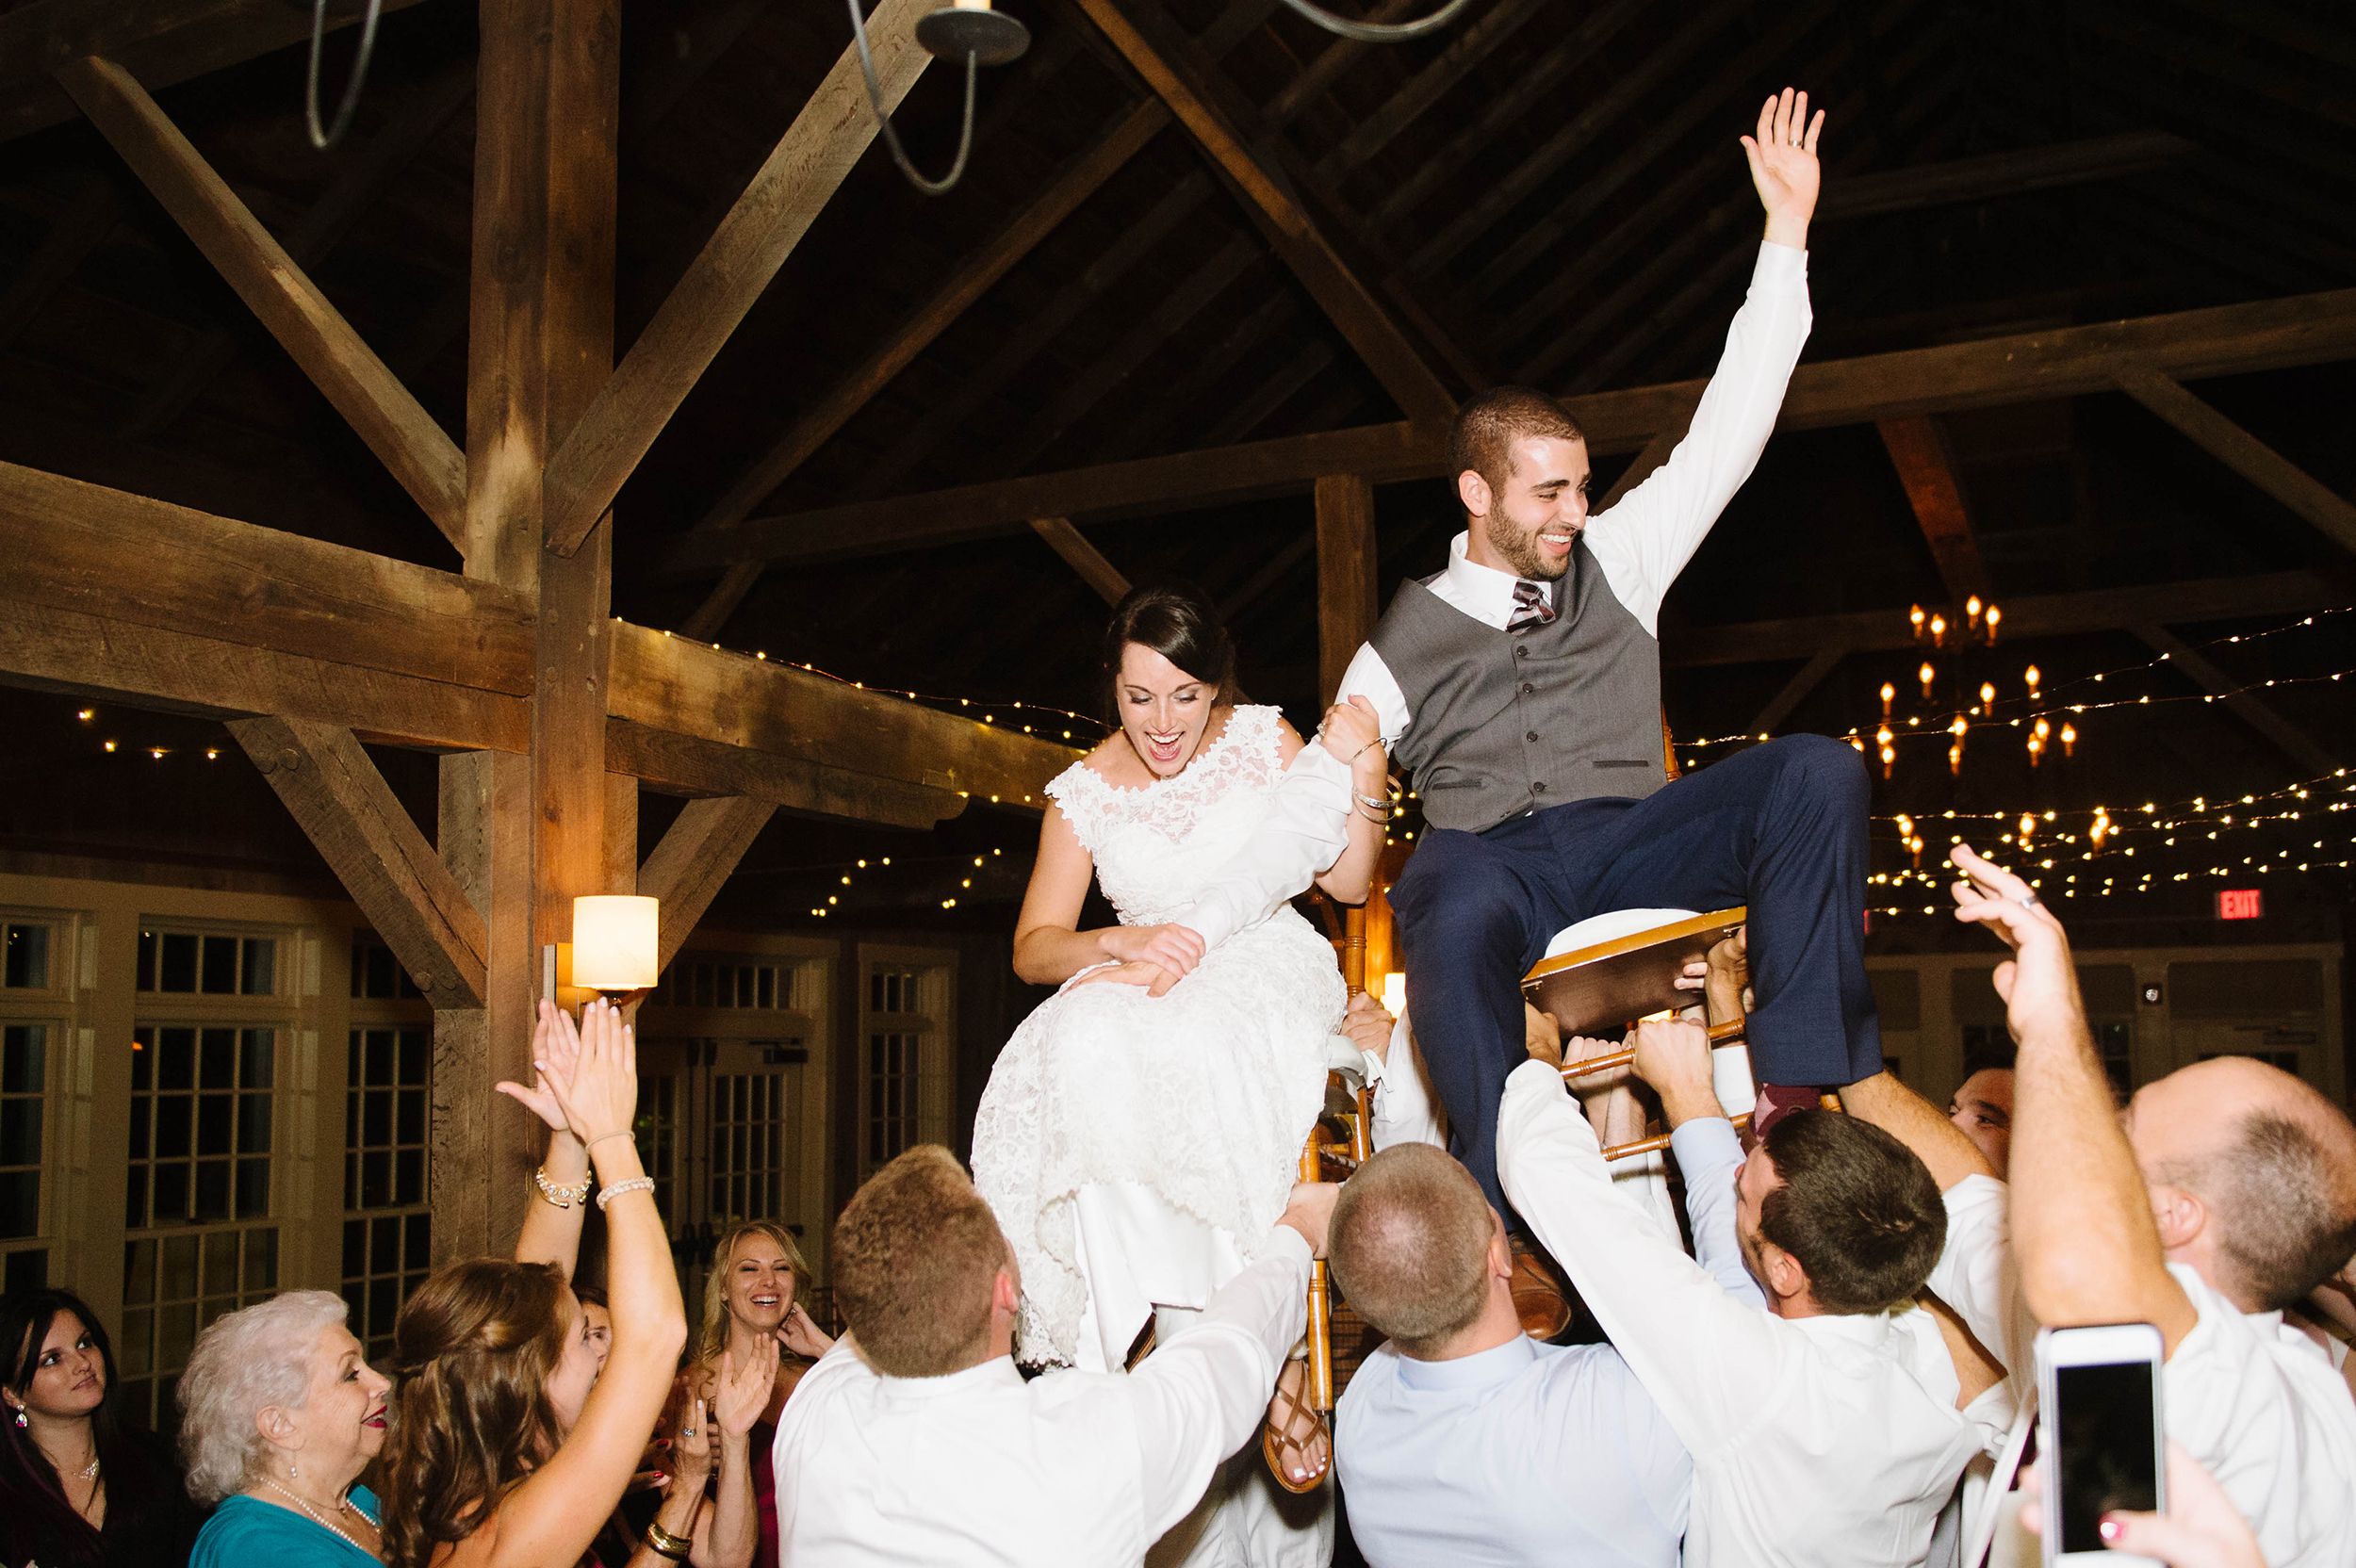 Quonquont-Farm-Wedding036.jpg